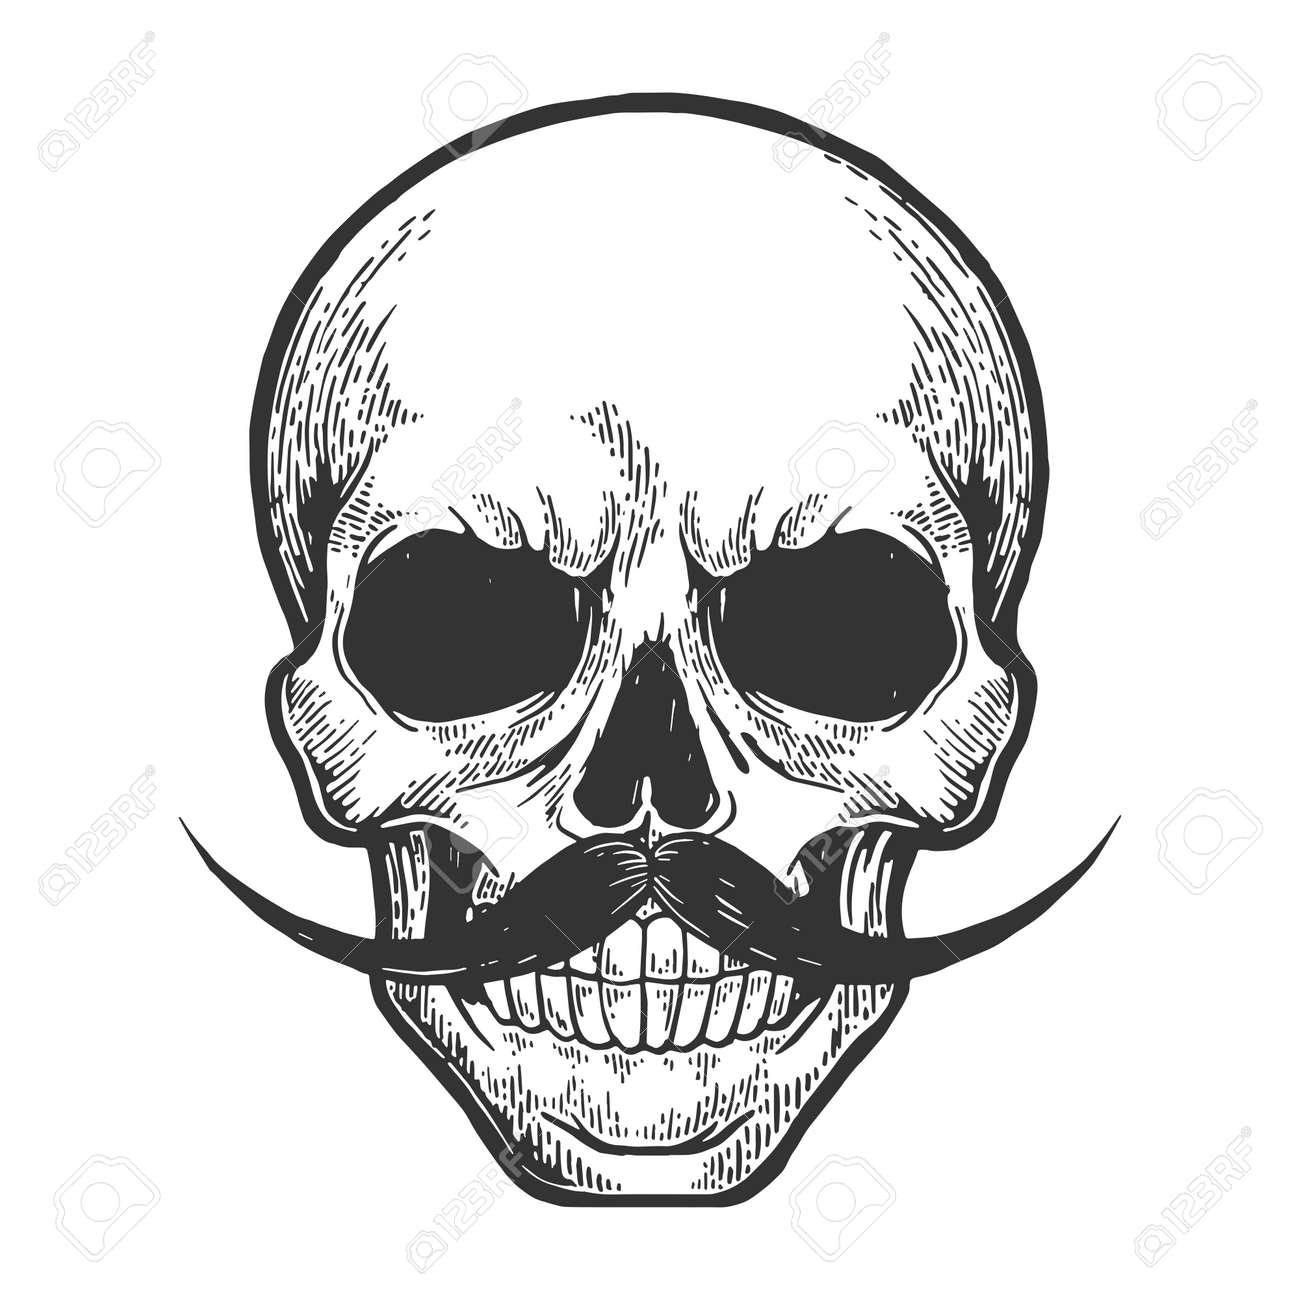 Human skull sketch engraving vector illustration. Scratch board style imitation. Hand drawn image. - 121609027